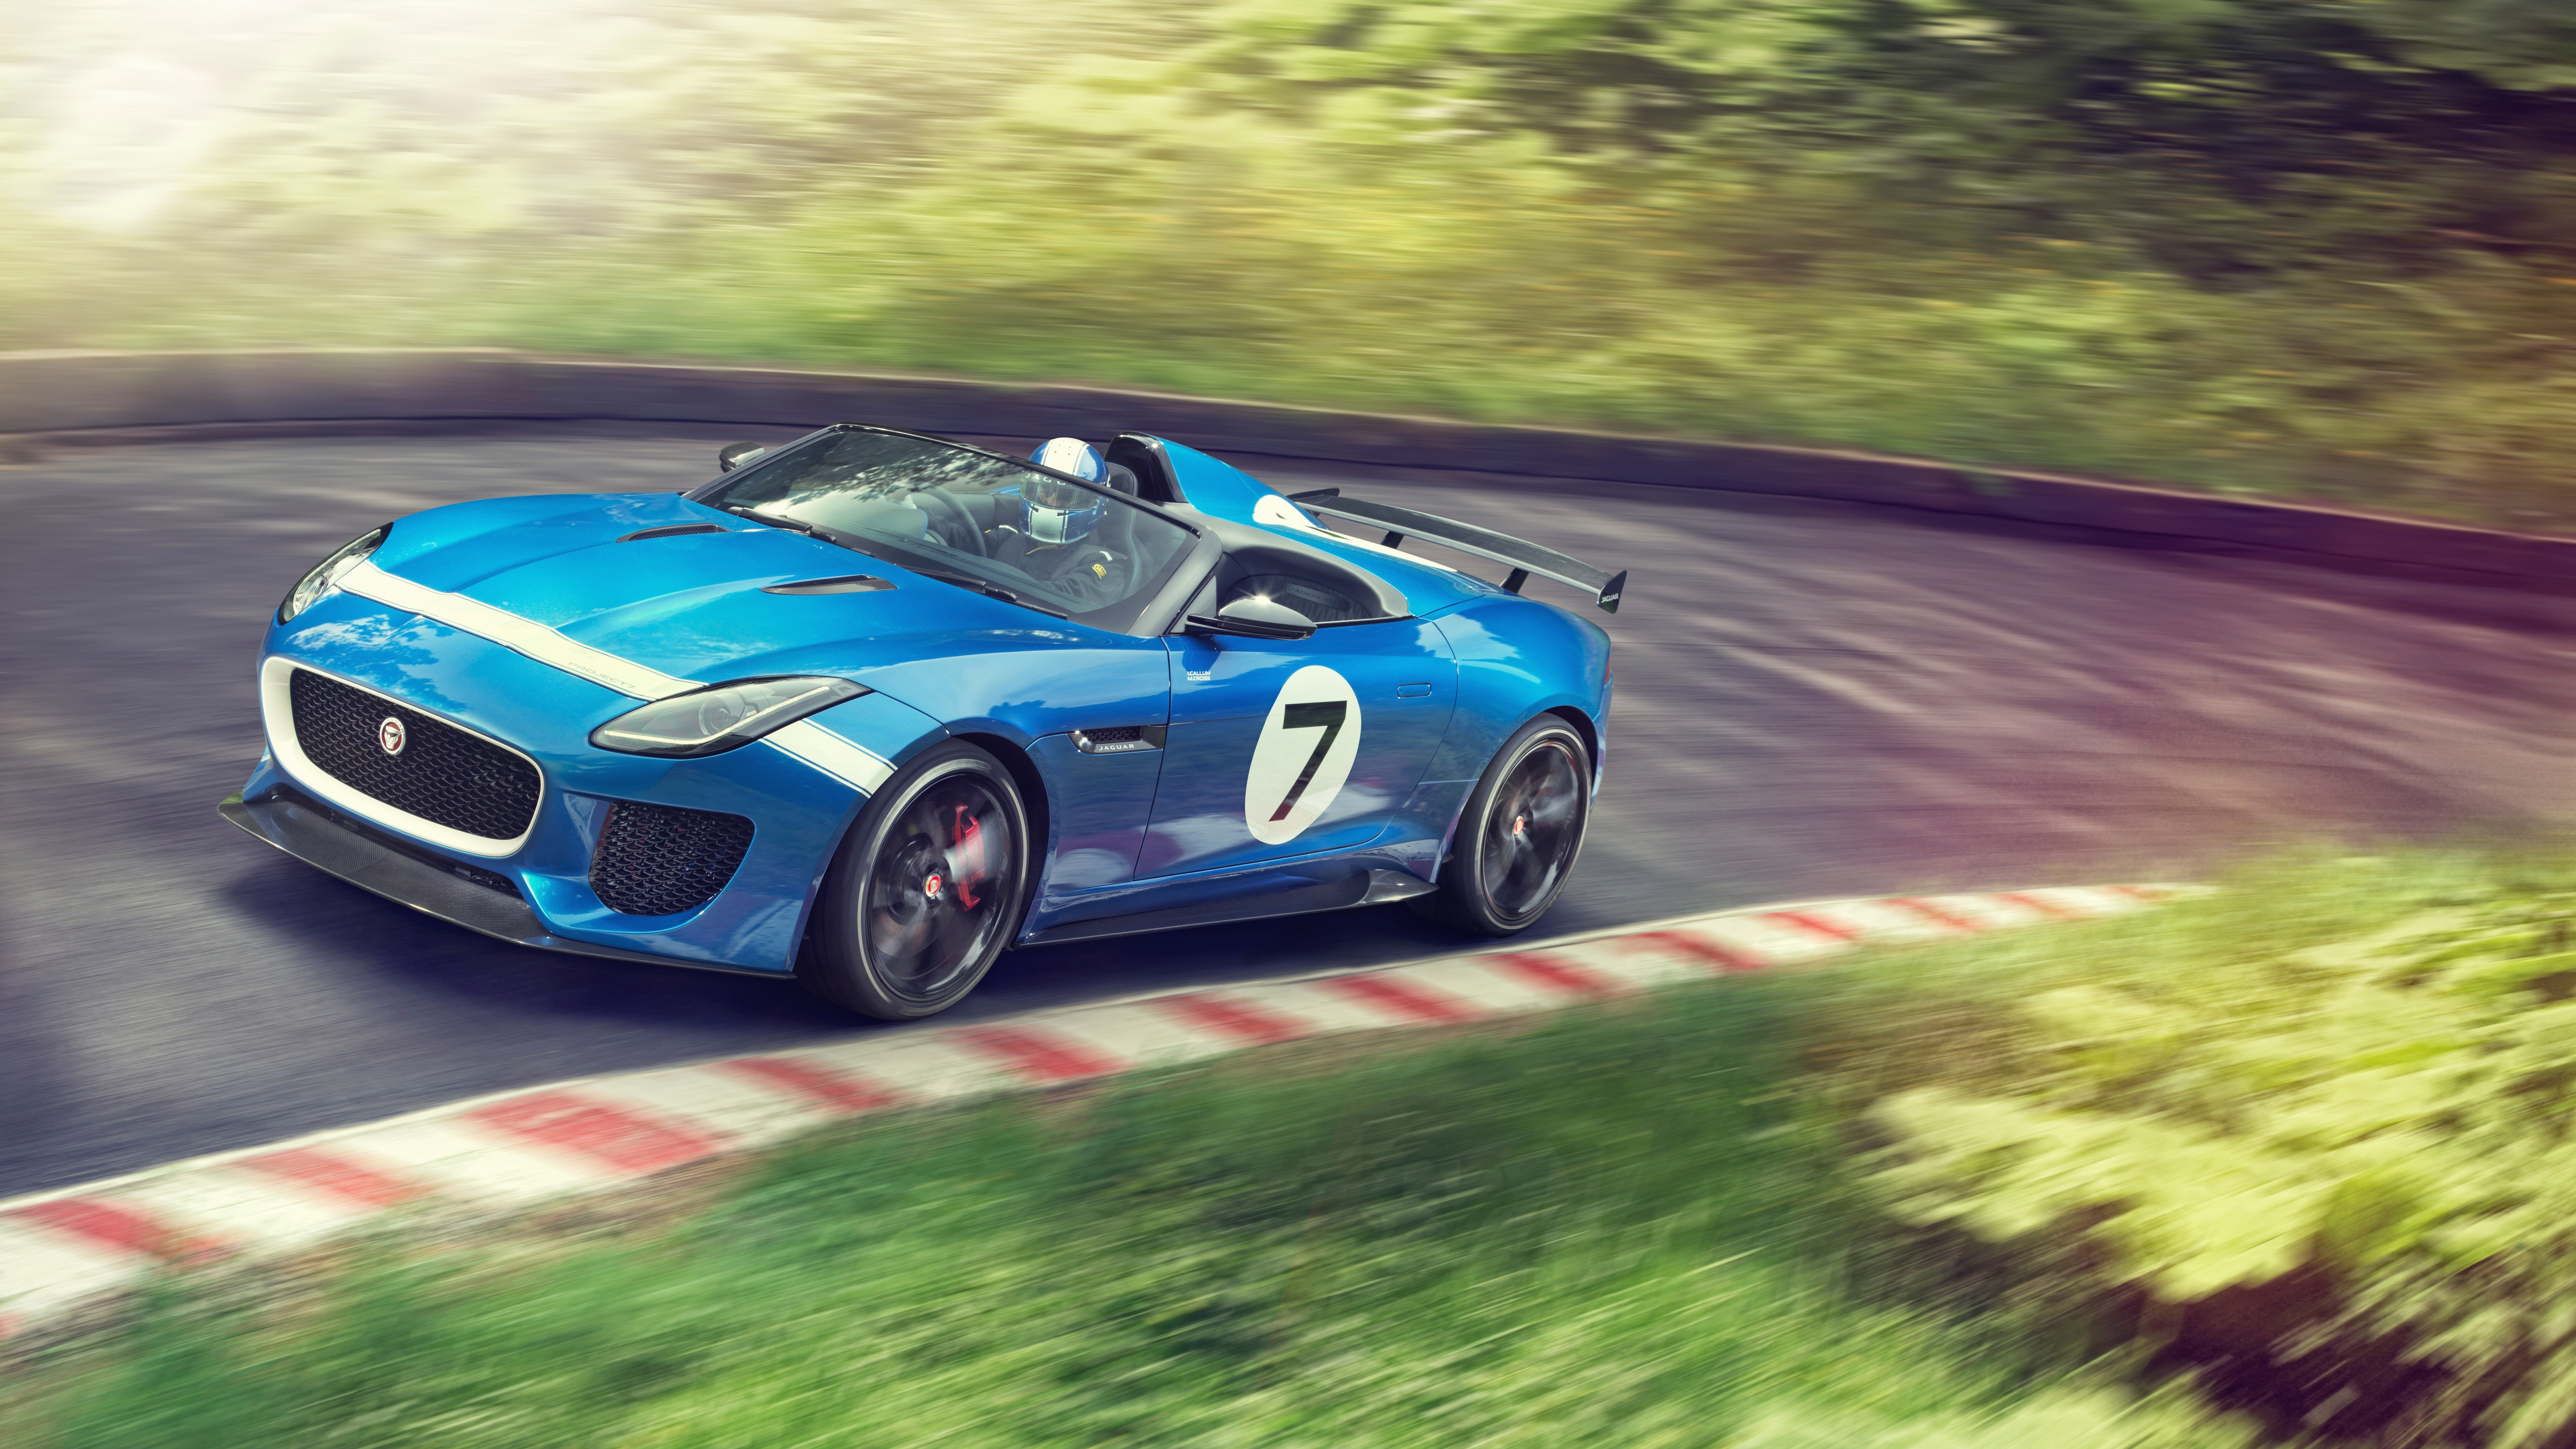 Jaguar F Type Sport, HD Cars, 4k Wallpapers, Images ...